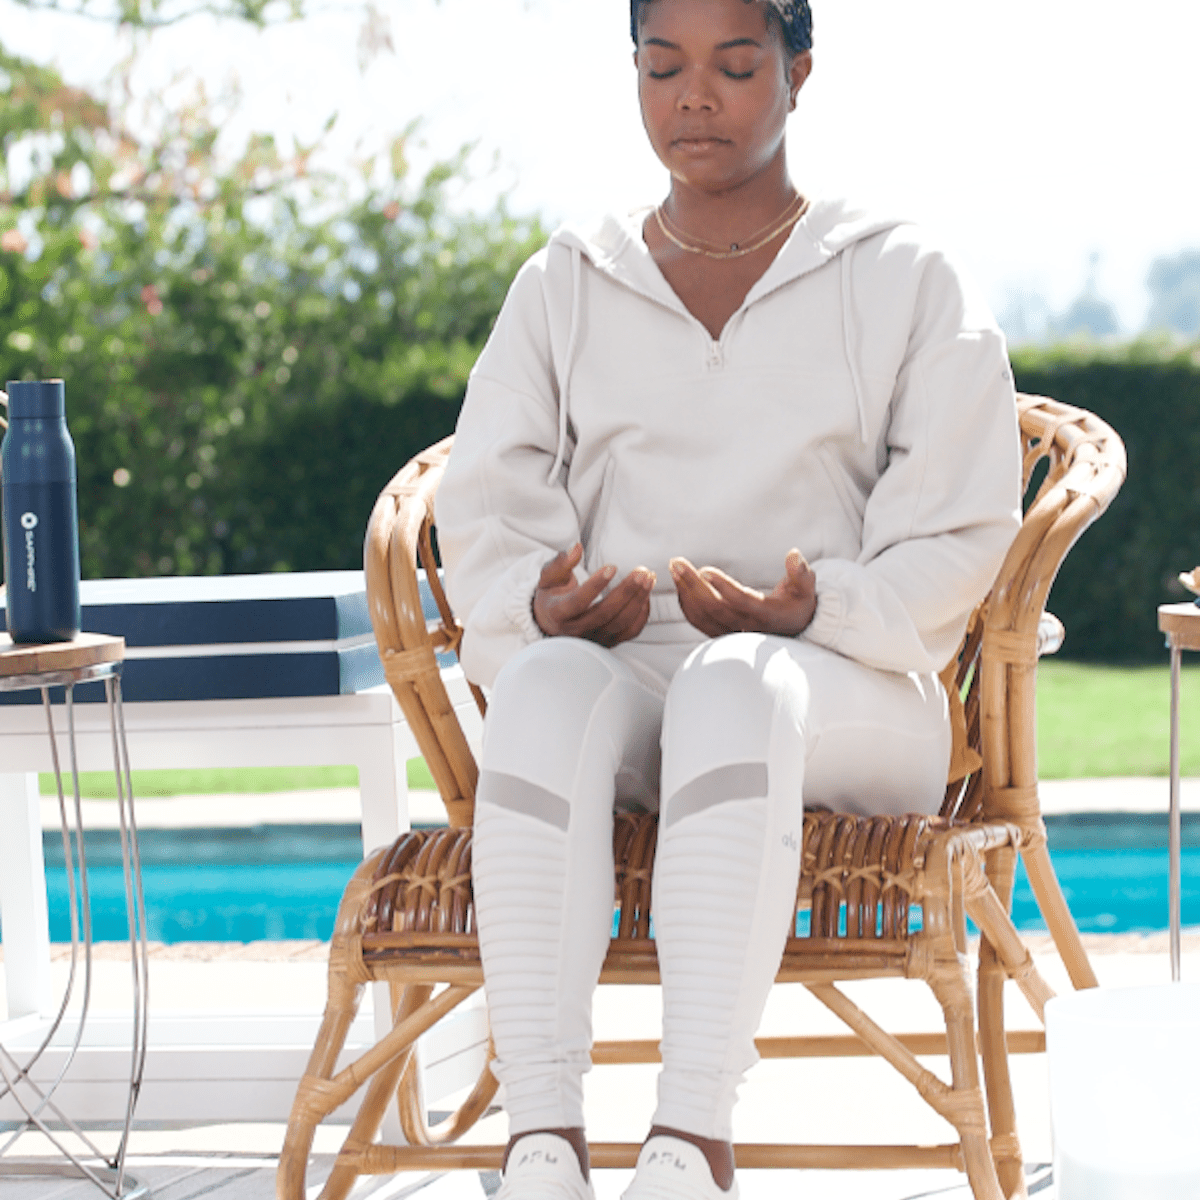 Chase Sapphire Gabrielle Union Meditating